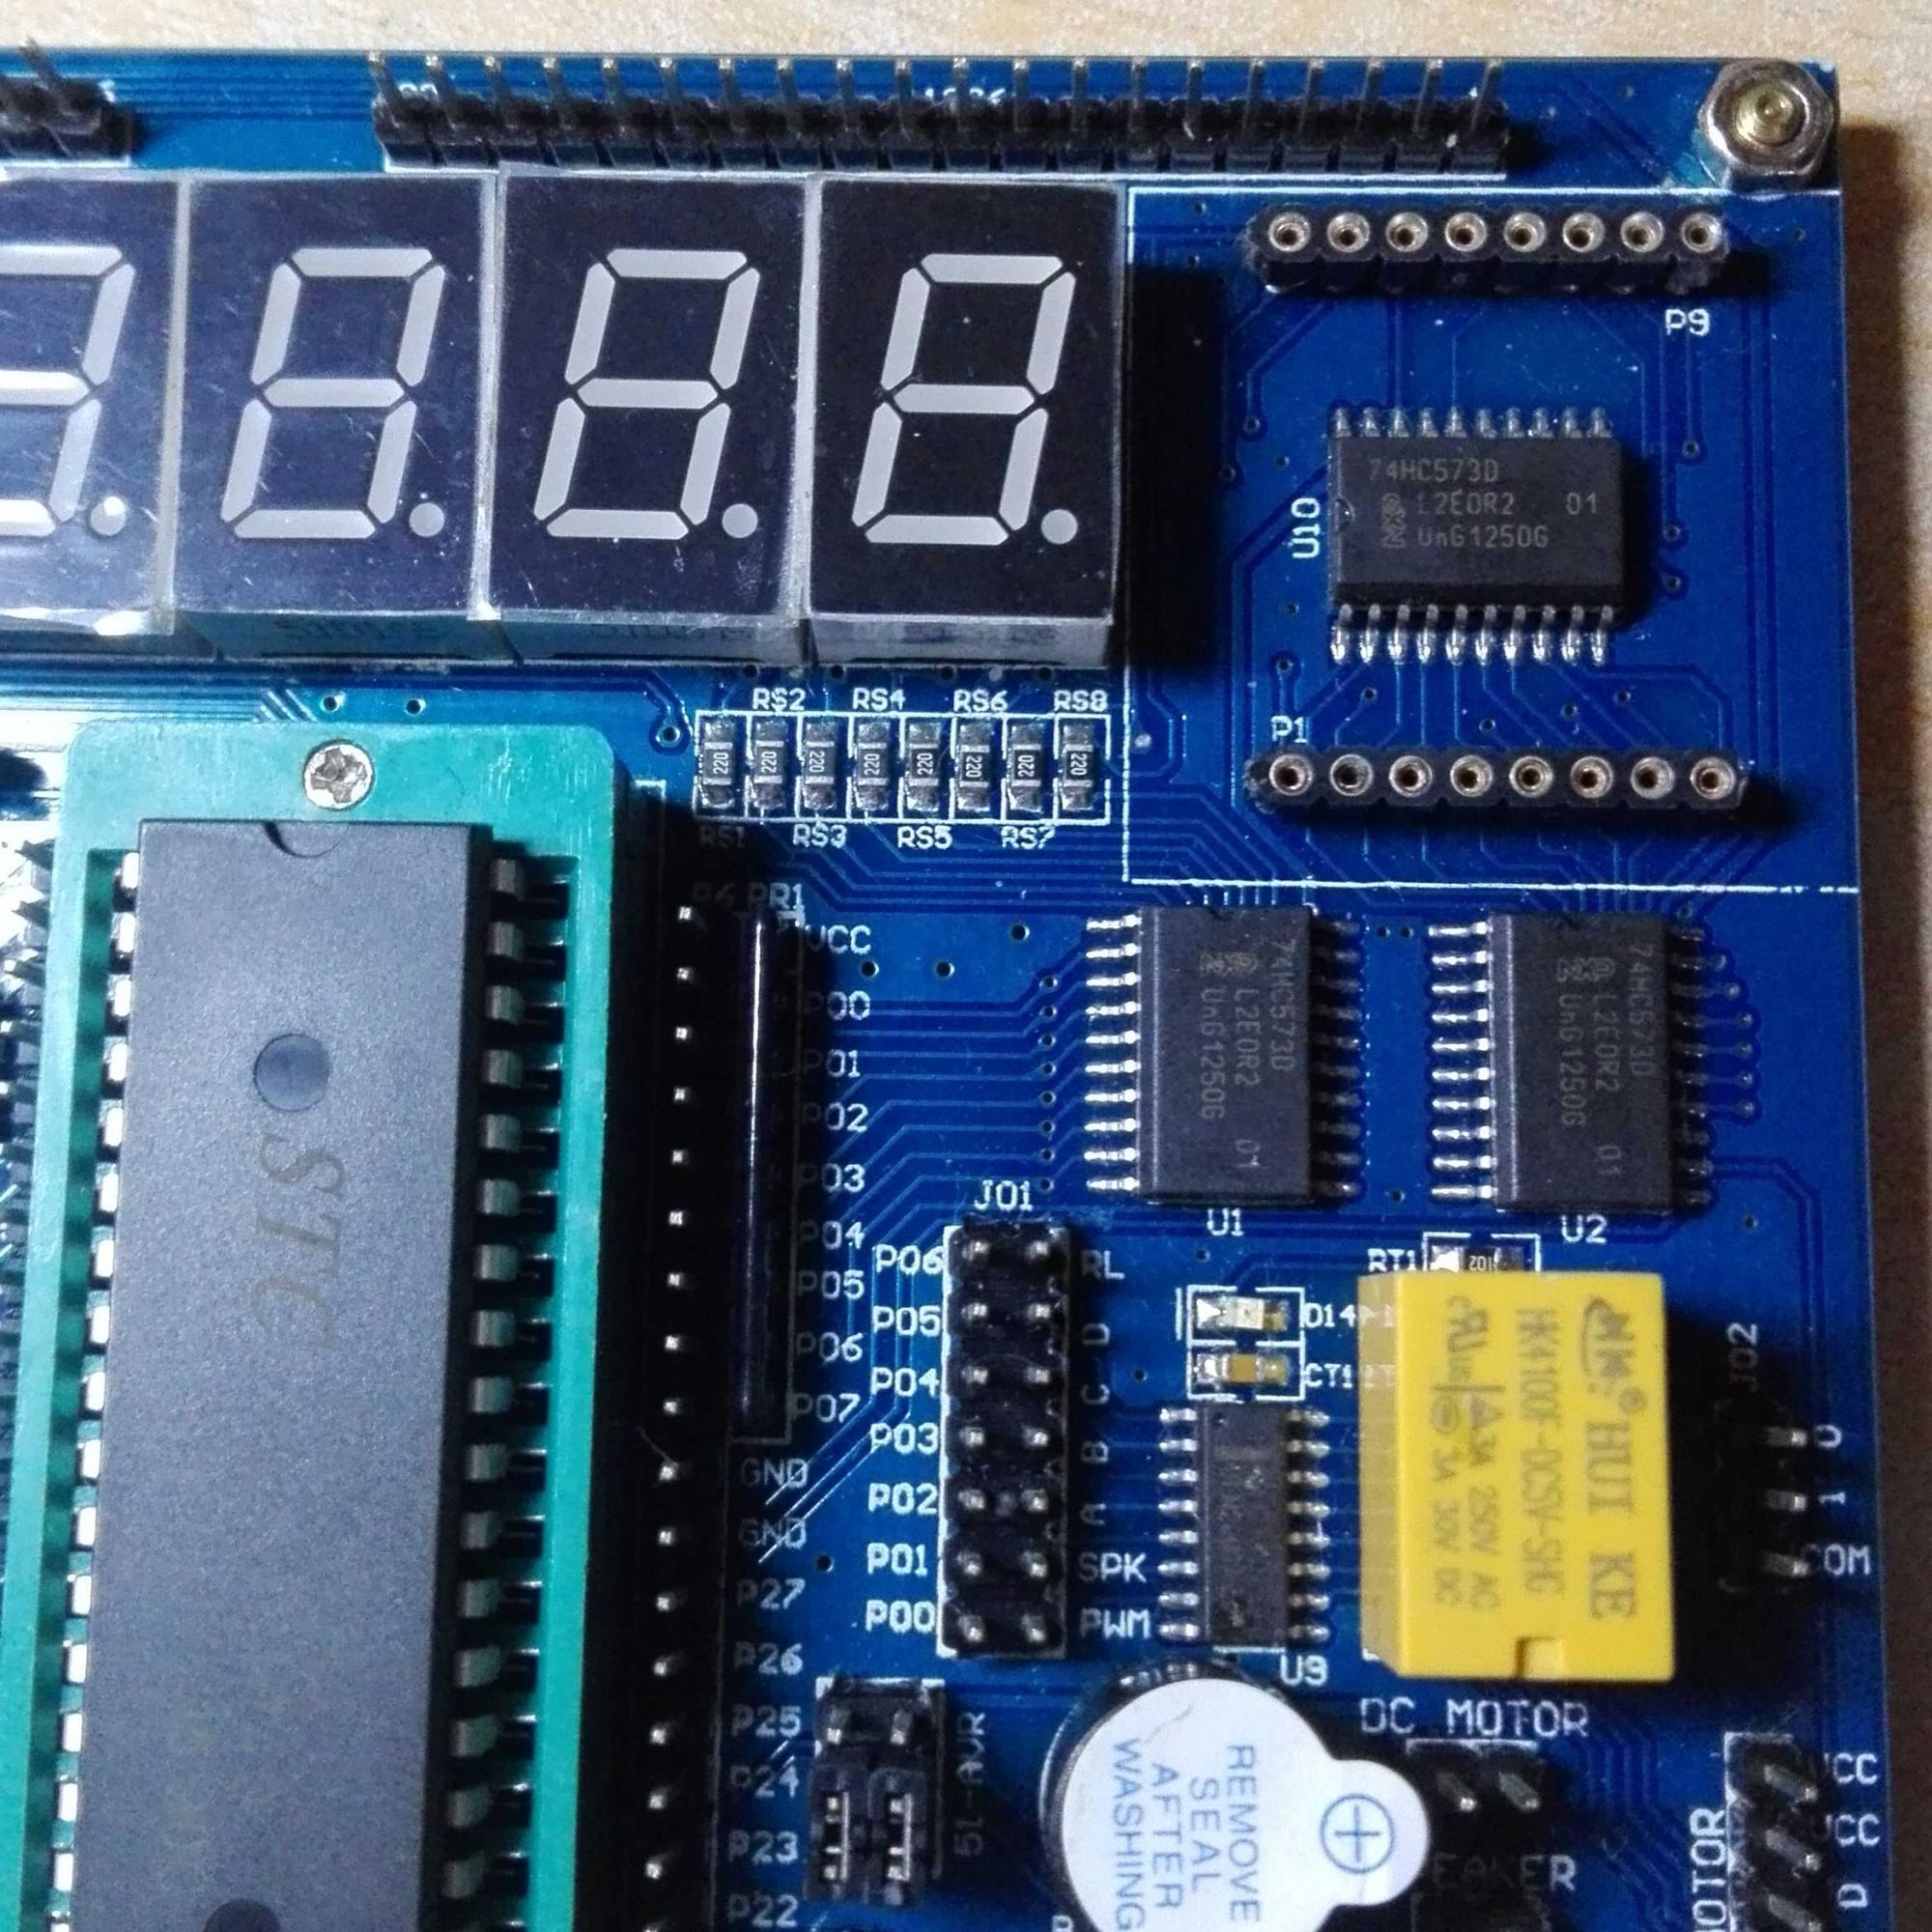 stc89c52r单片机的蜂鸣器问题